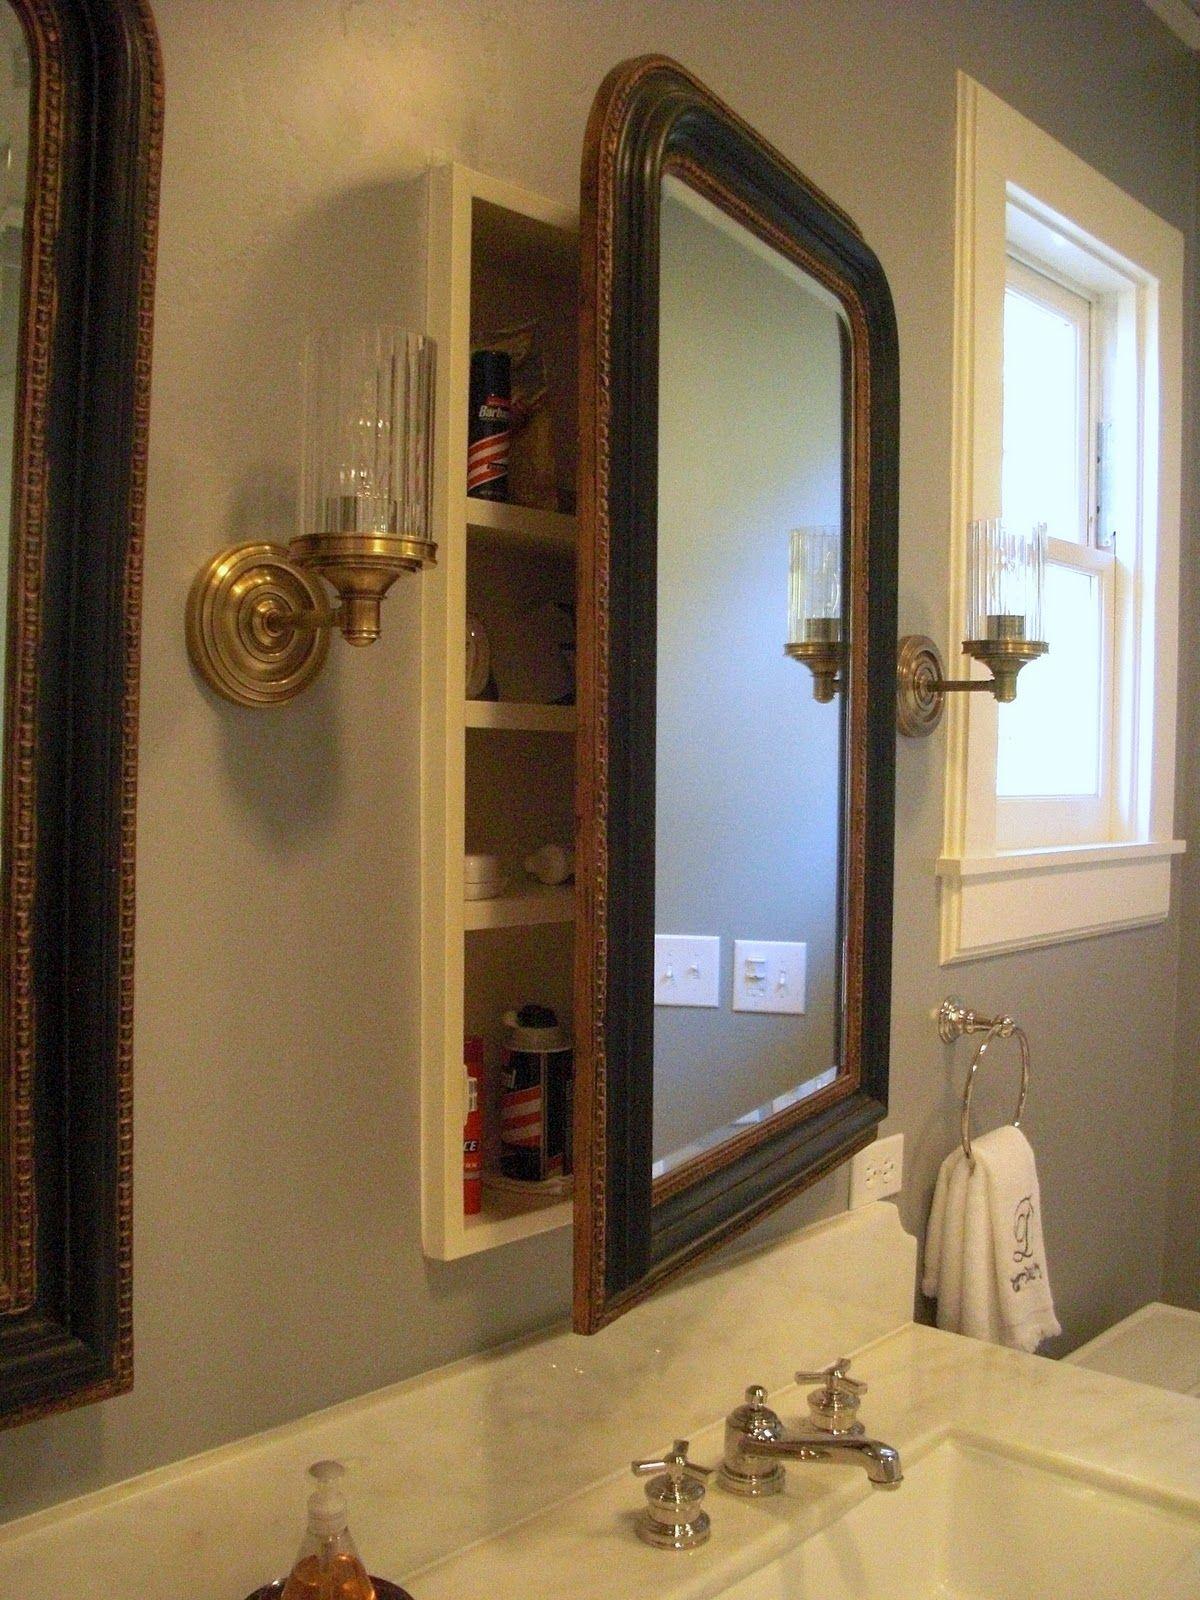 Master Bath Before And After Cote De Texas Blog Restoration Hardware Mirror Wall Shelf Decor Mirror Cabinets